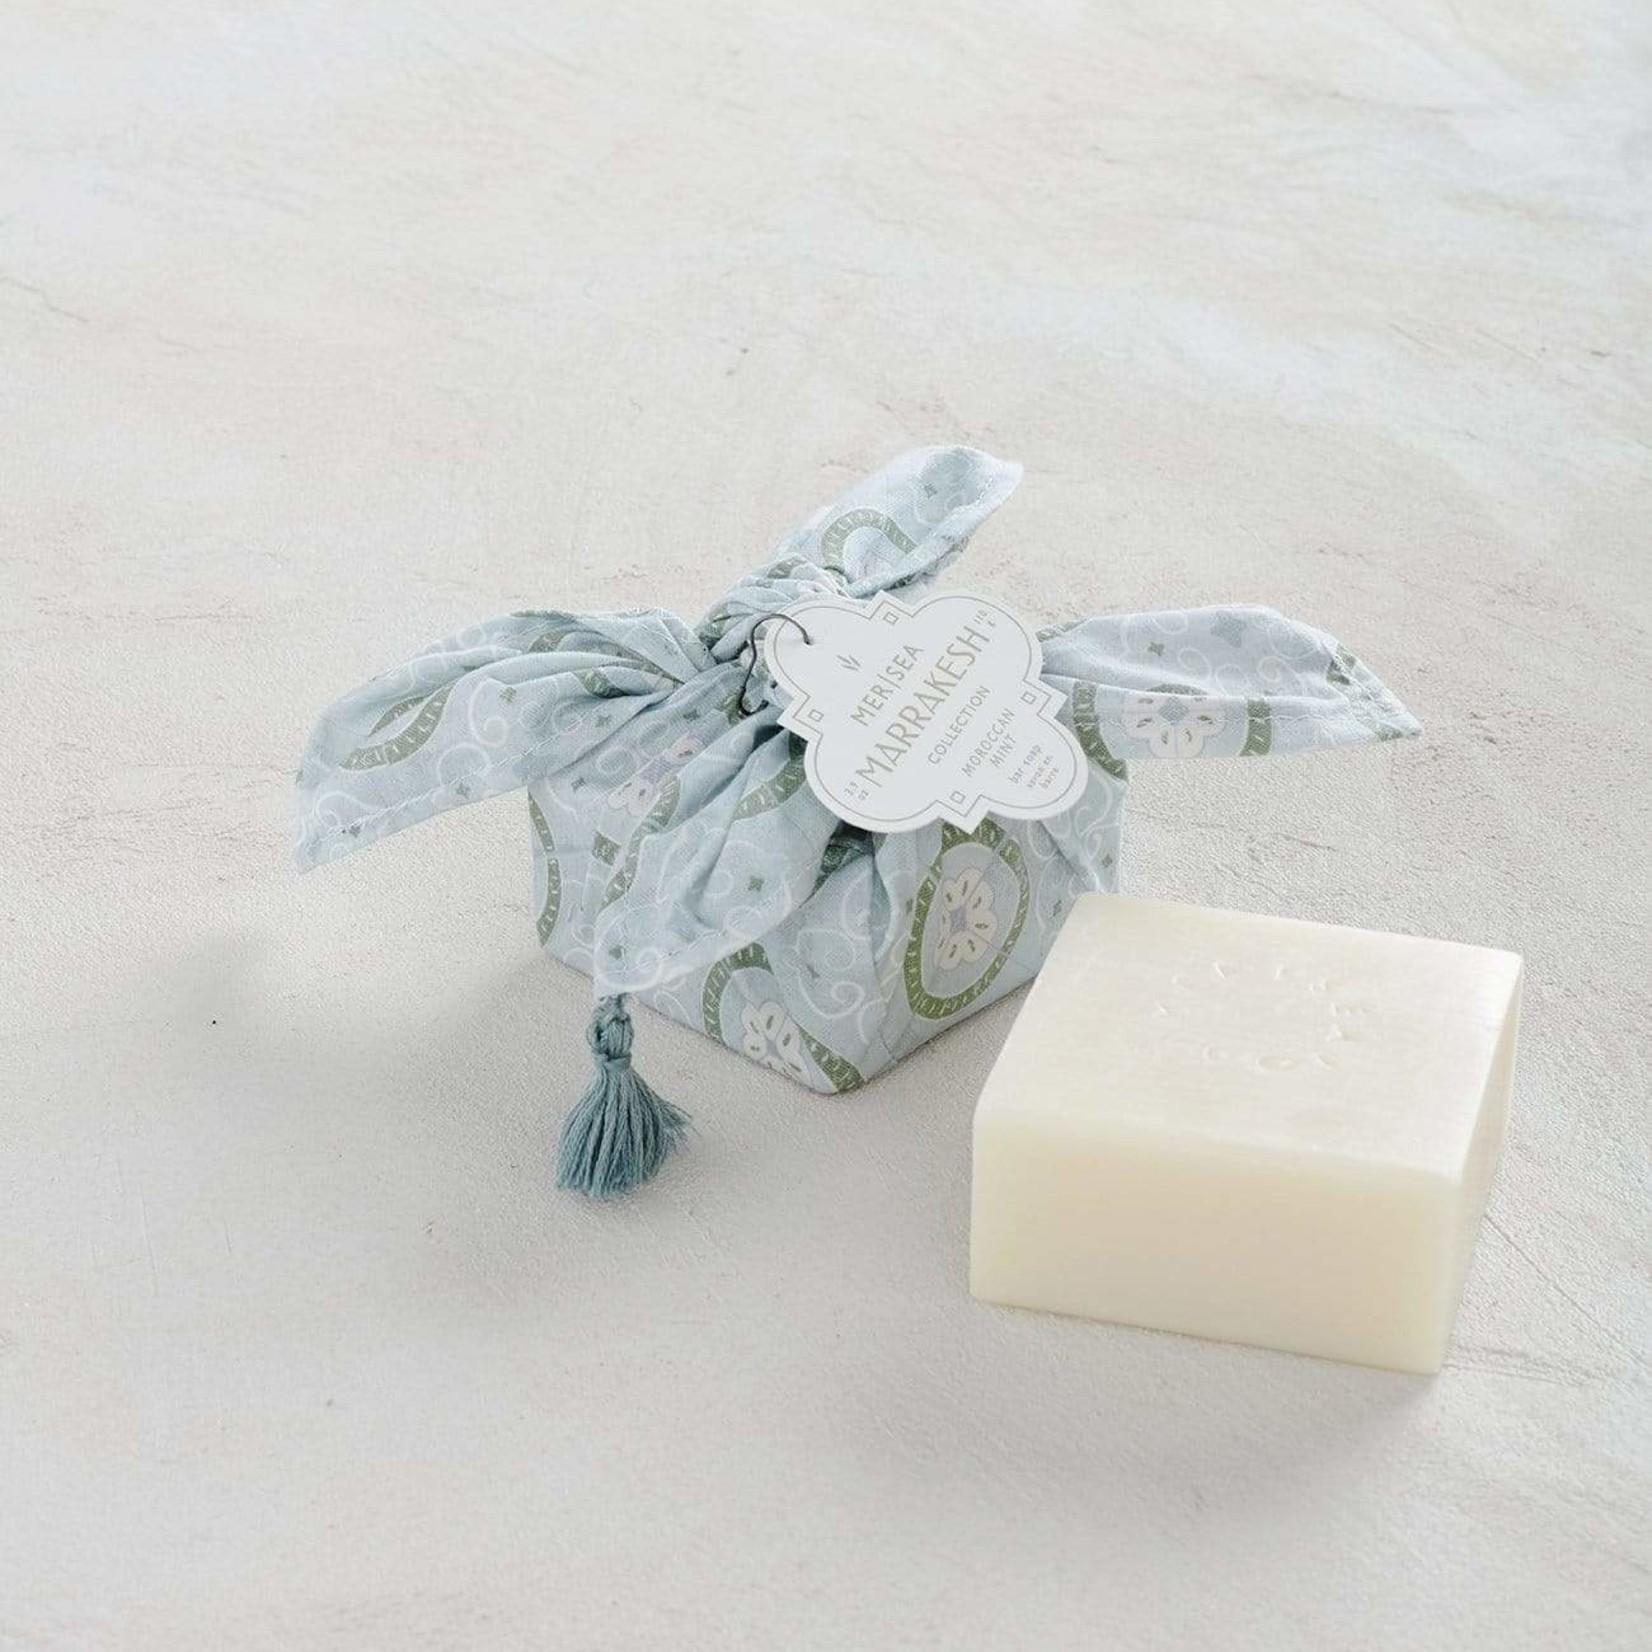 Mer Sea Mint Wrapped Soap